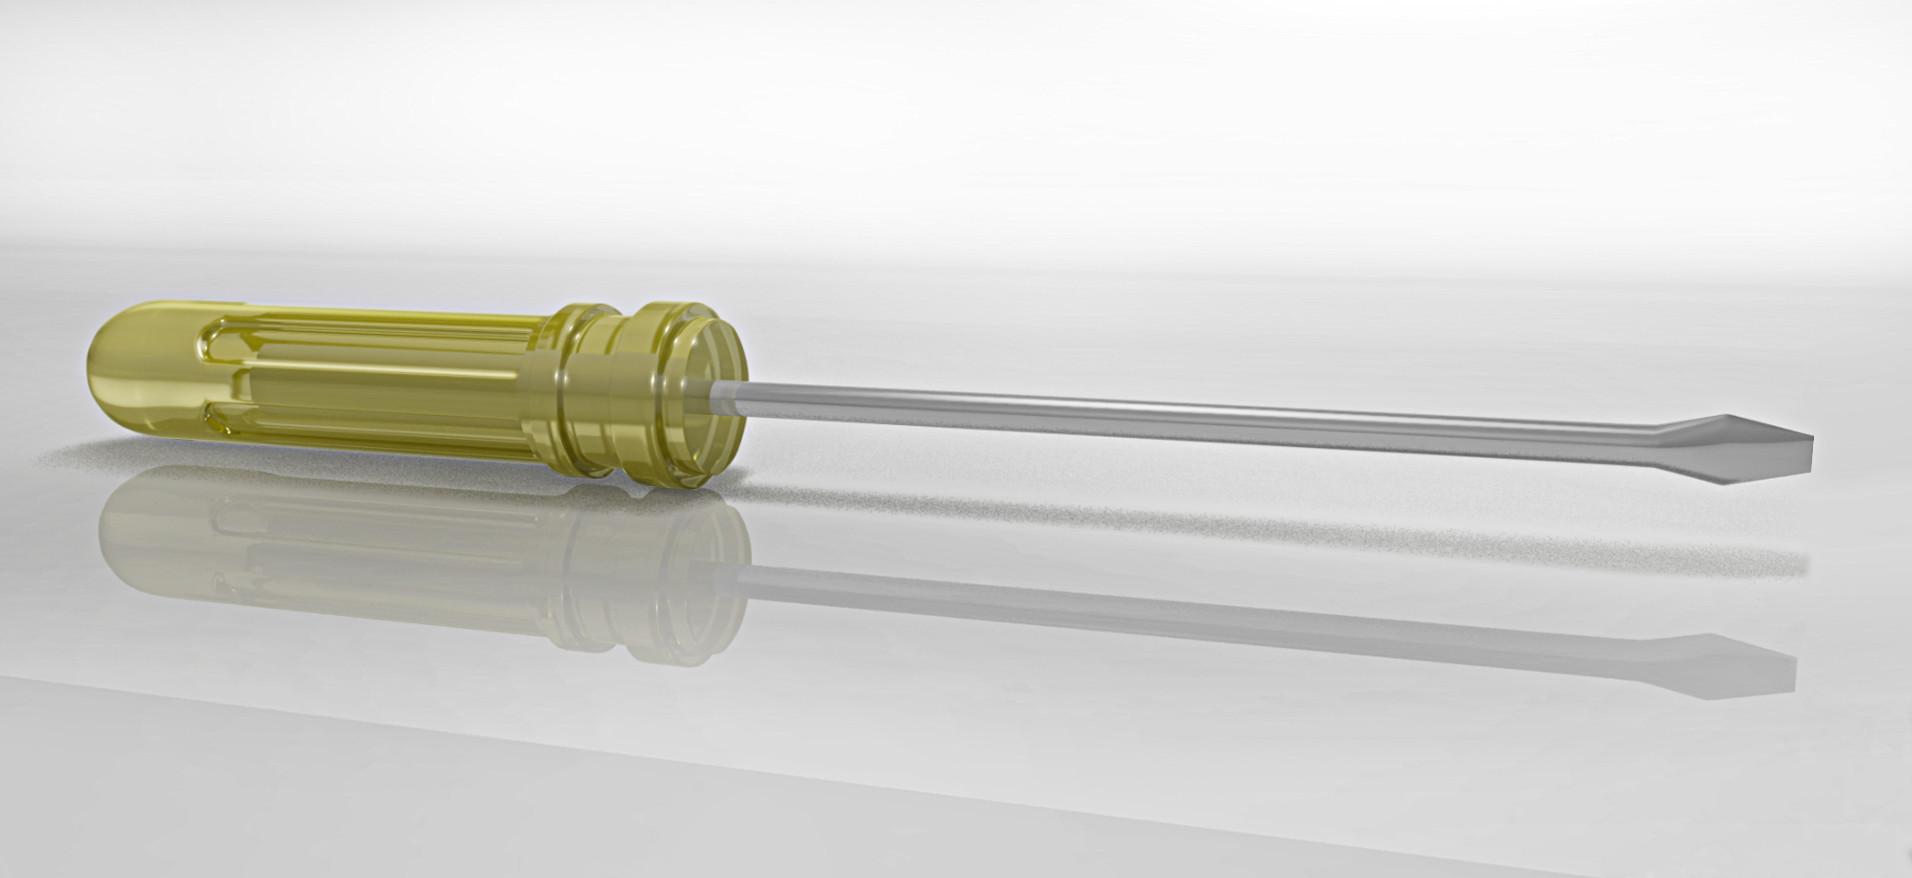 Rajesh sawant screwdriver